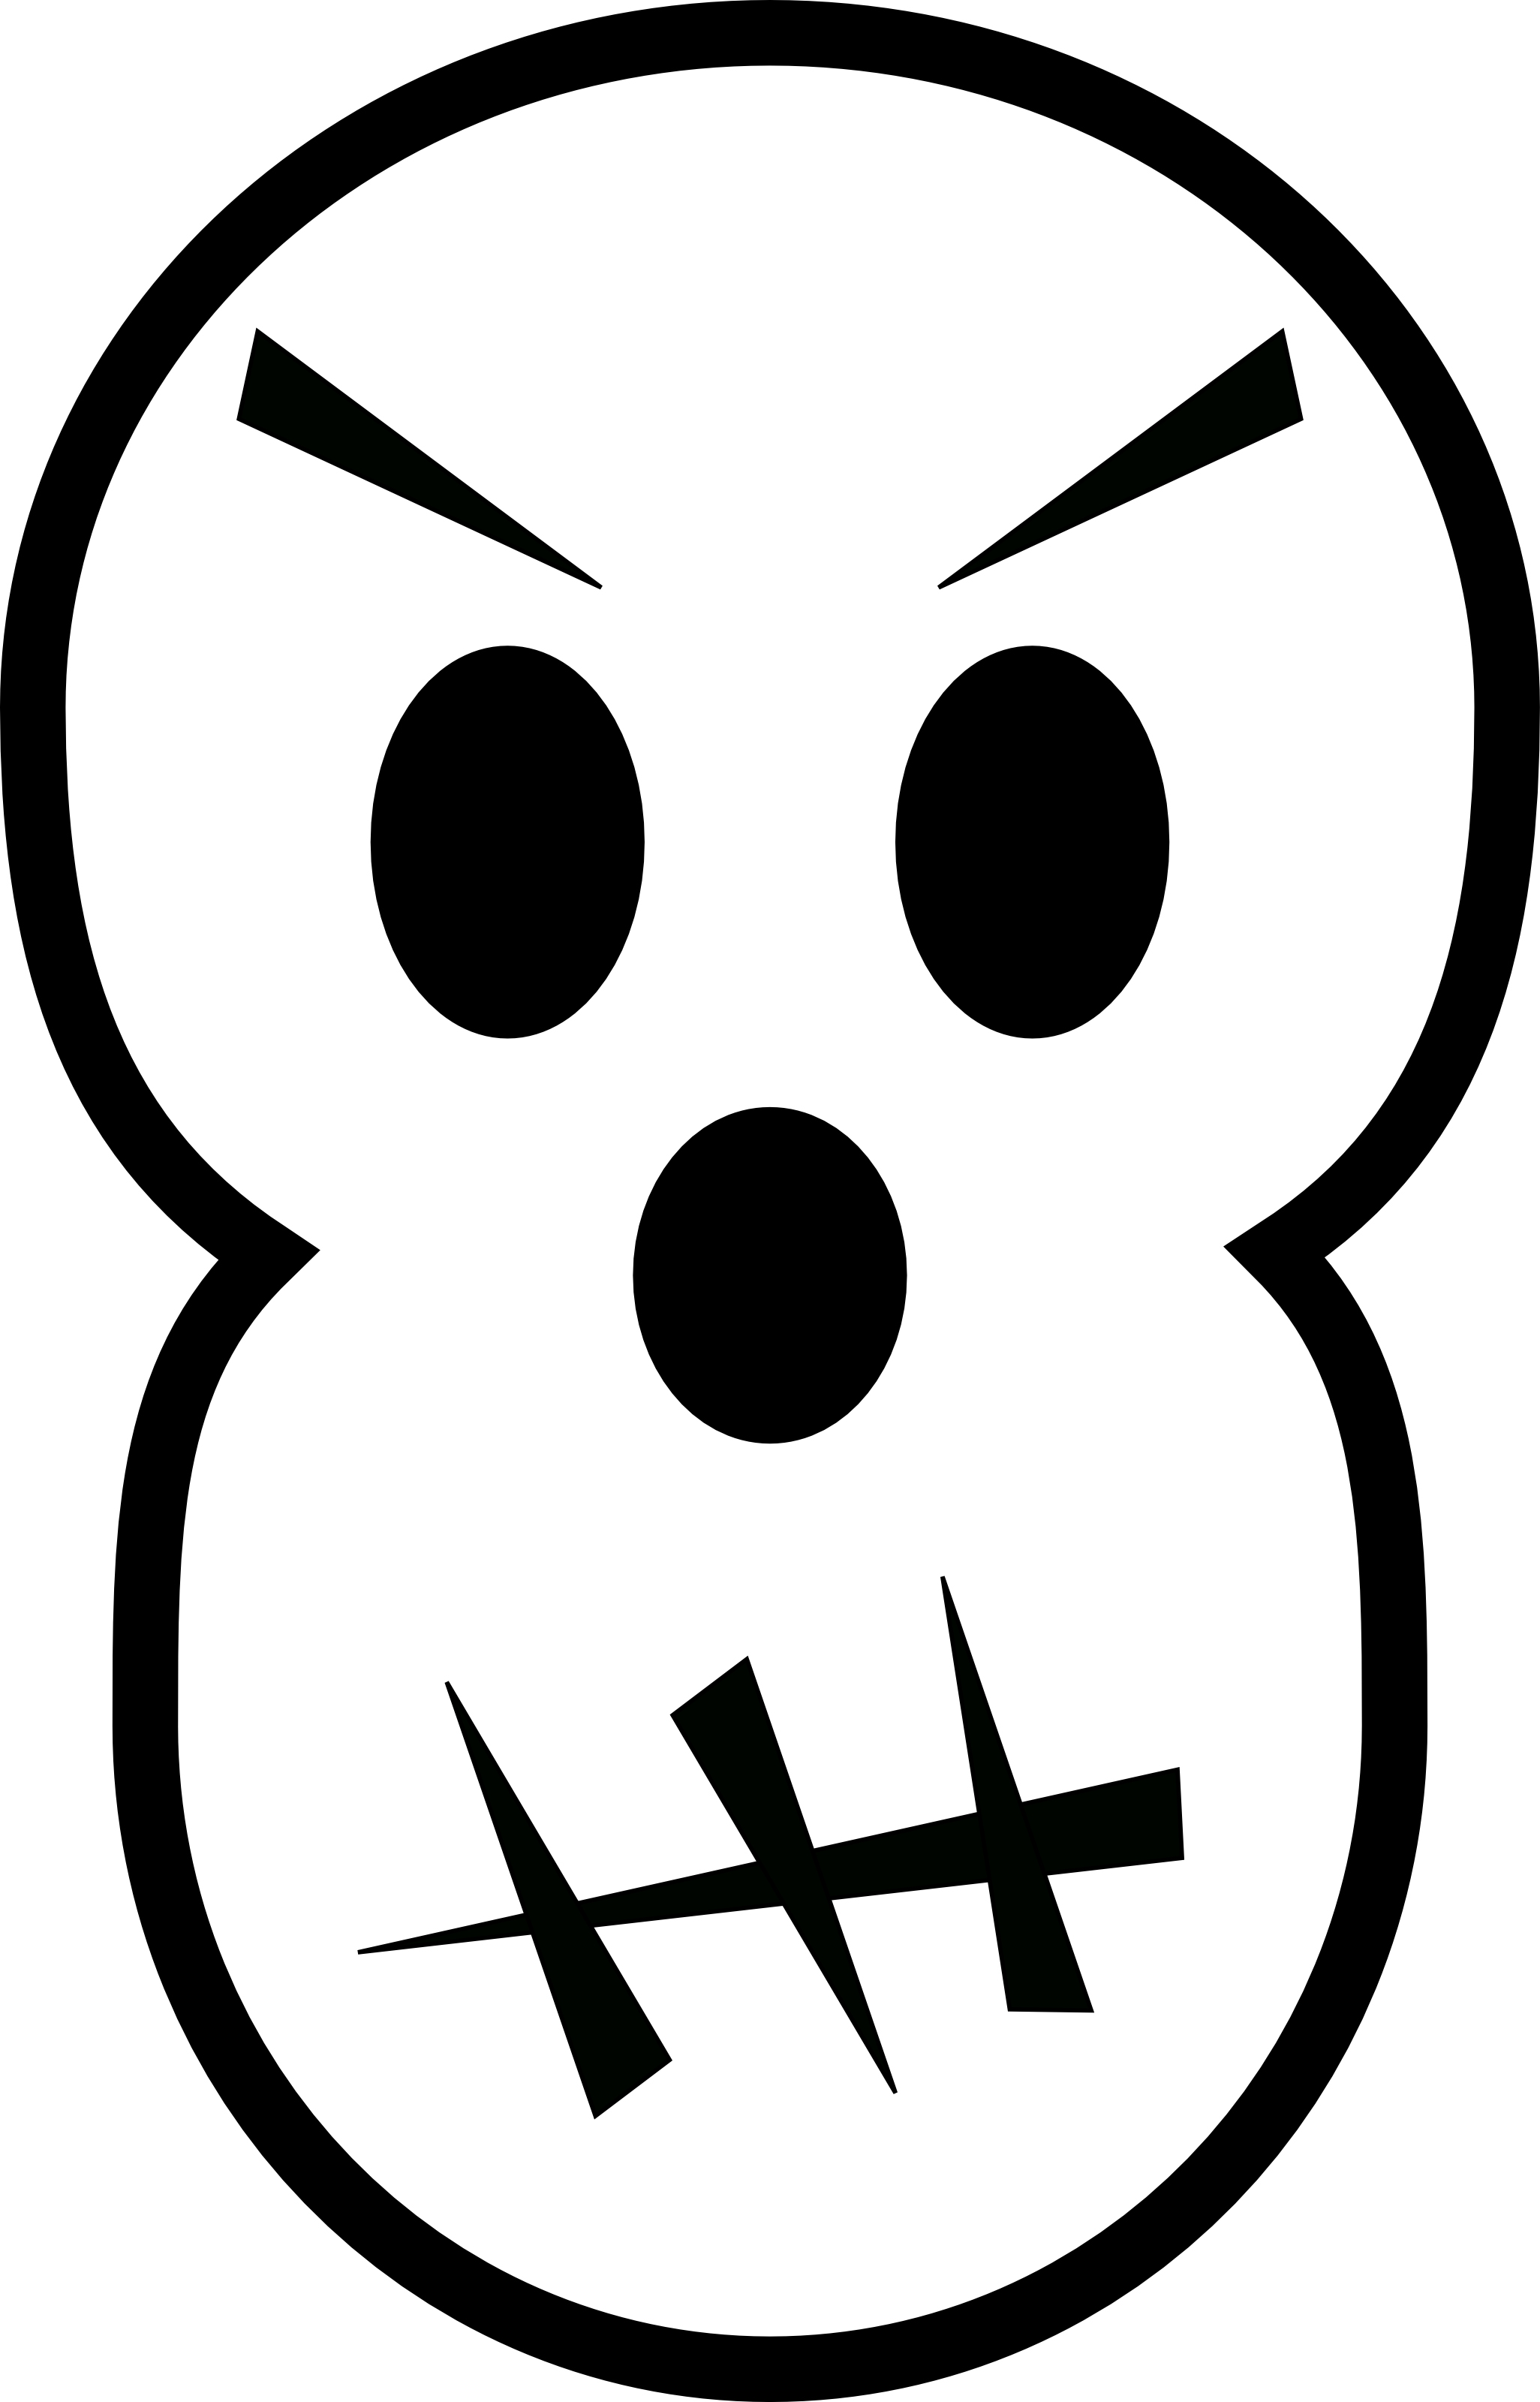 Halloween Bat Clipart Black And White Clipart Panda Free Clipart